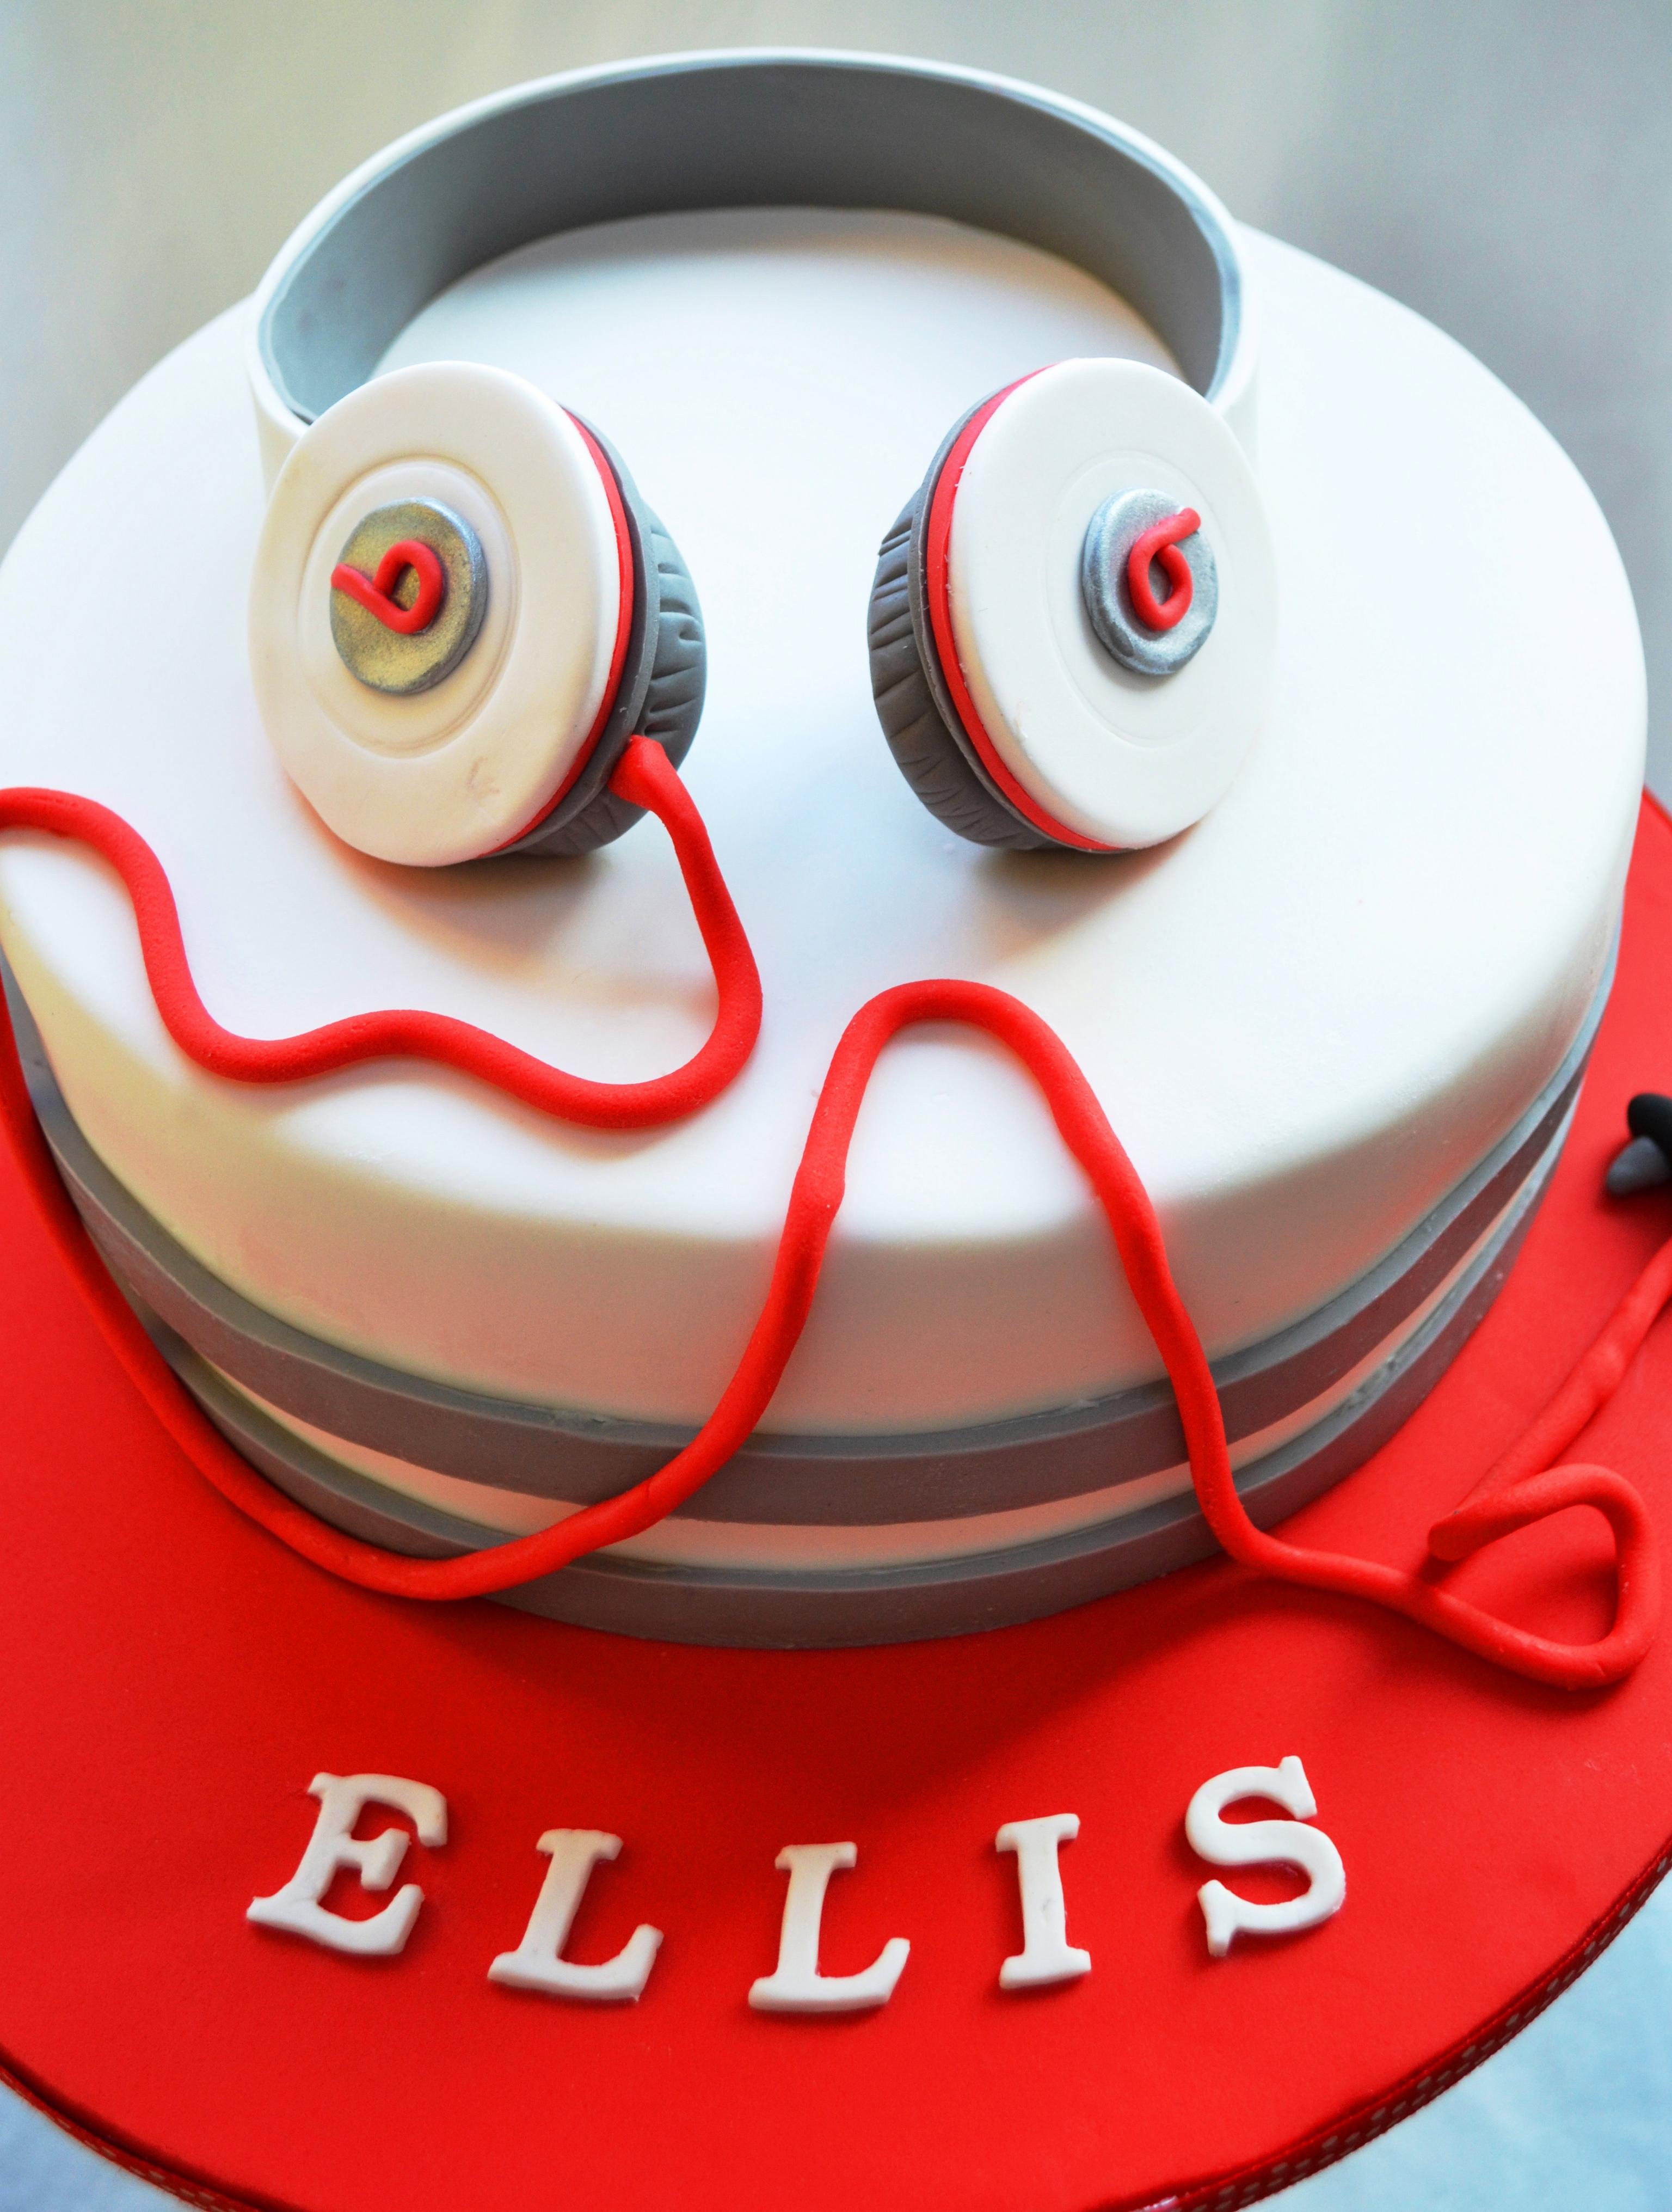 How To Make A Beats Headphone Cake Topper